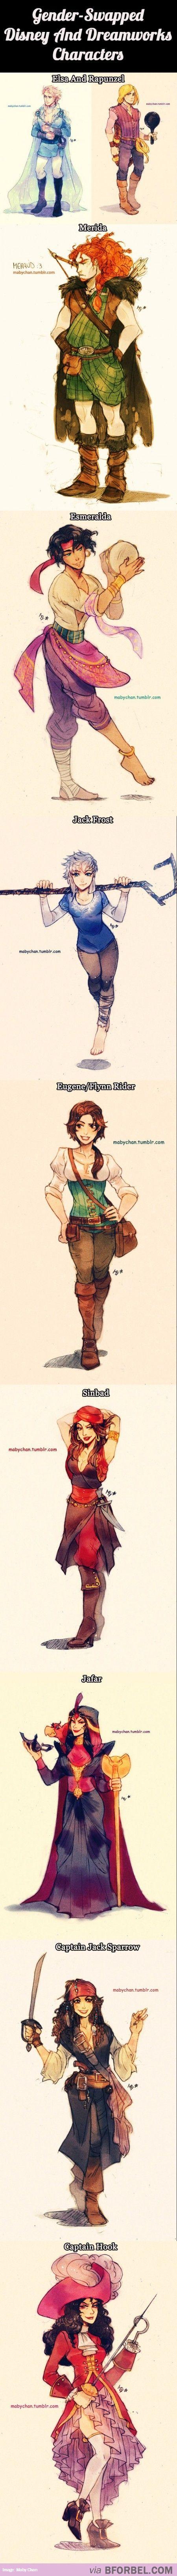 genderbent: Disney Dreamworks Pixar, Dreamworks Characters, Disney Genderbends, Disney Gender Bend, Genderswap Disney, Disney And Dreamworks, Gender Swapped Disney, Disney Genderbent